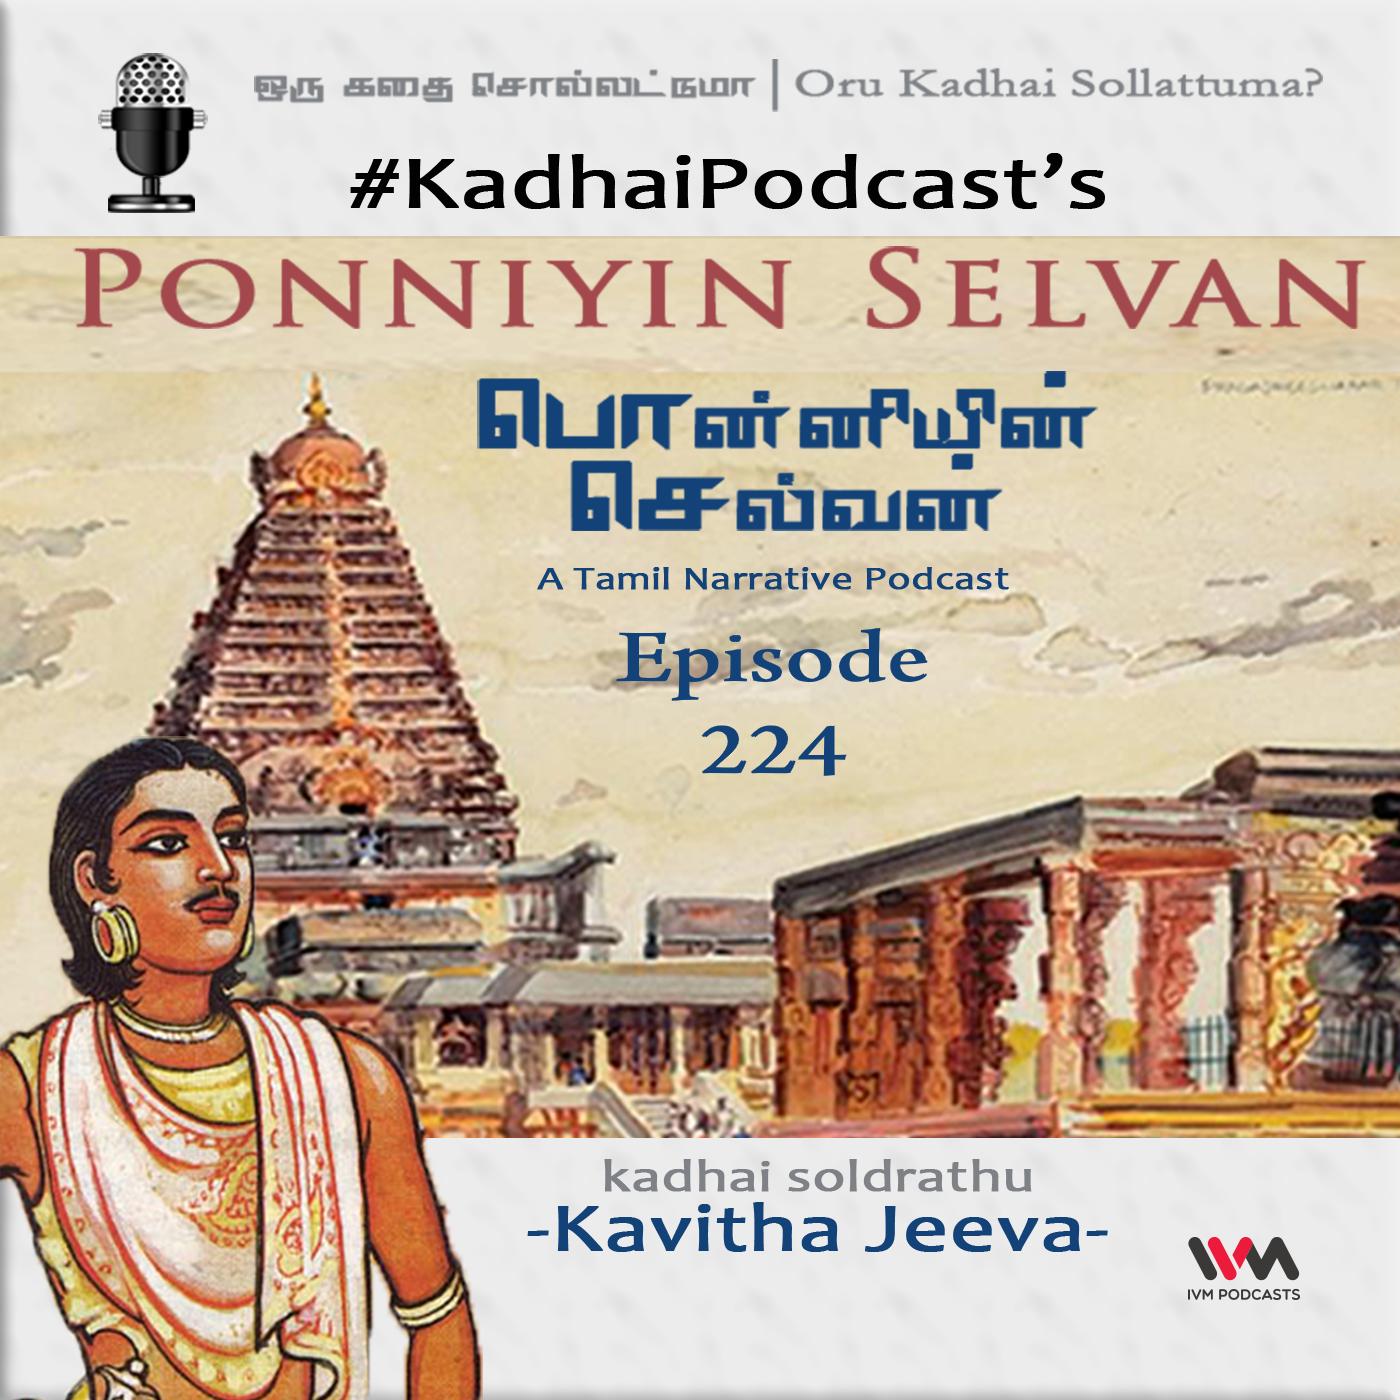 KadhaiPodcast's Ponniyin Selvan - Episode # 224